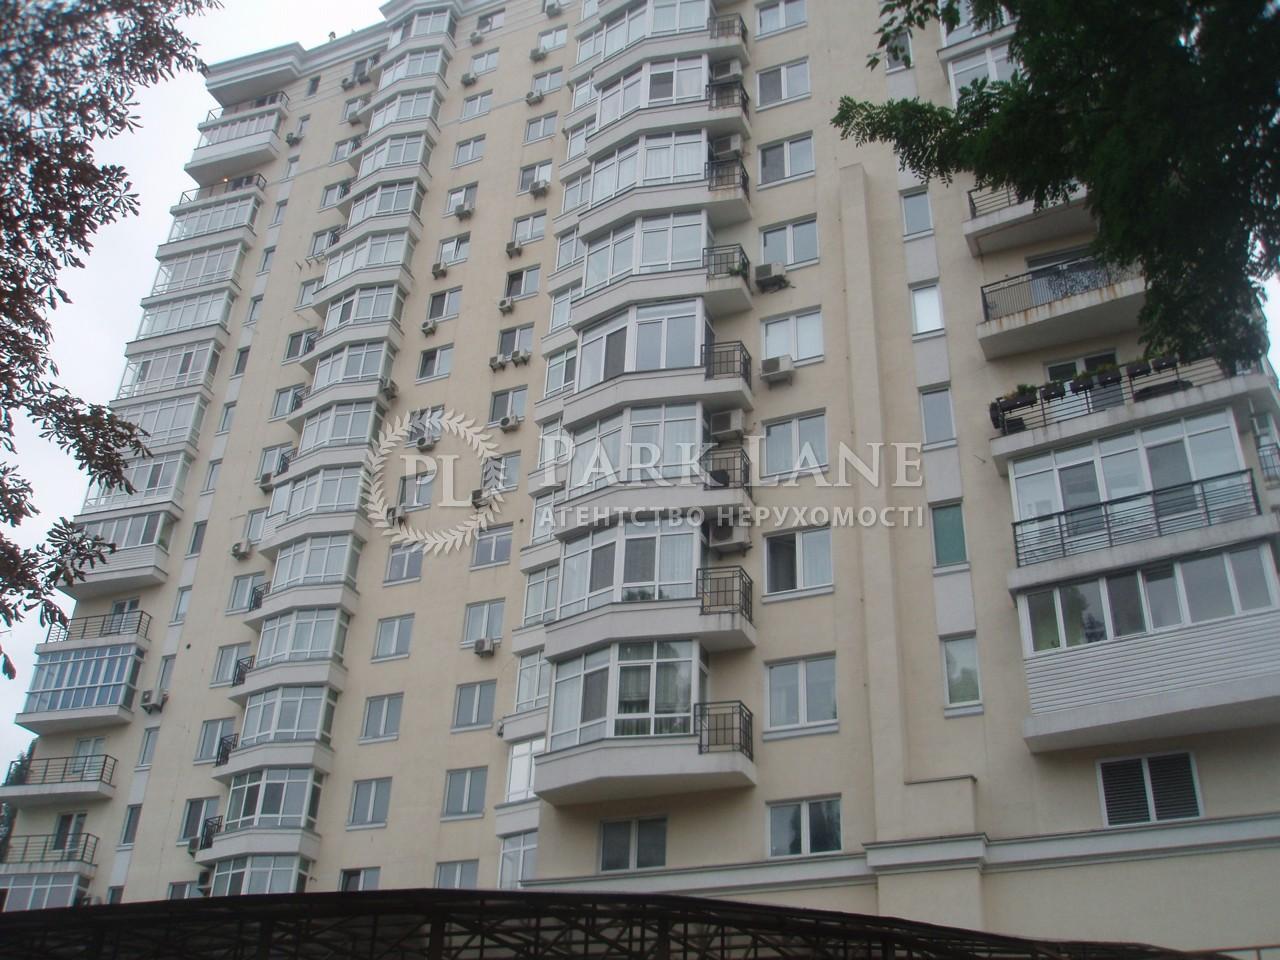 Квартира ул. Сечевых Стрельцов (Артема), 52а, Киев, R-5163 - Фото 18